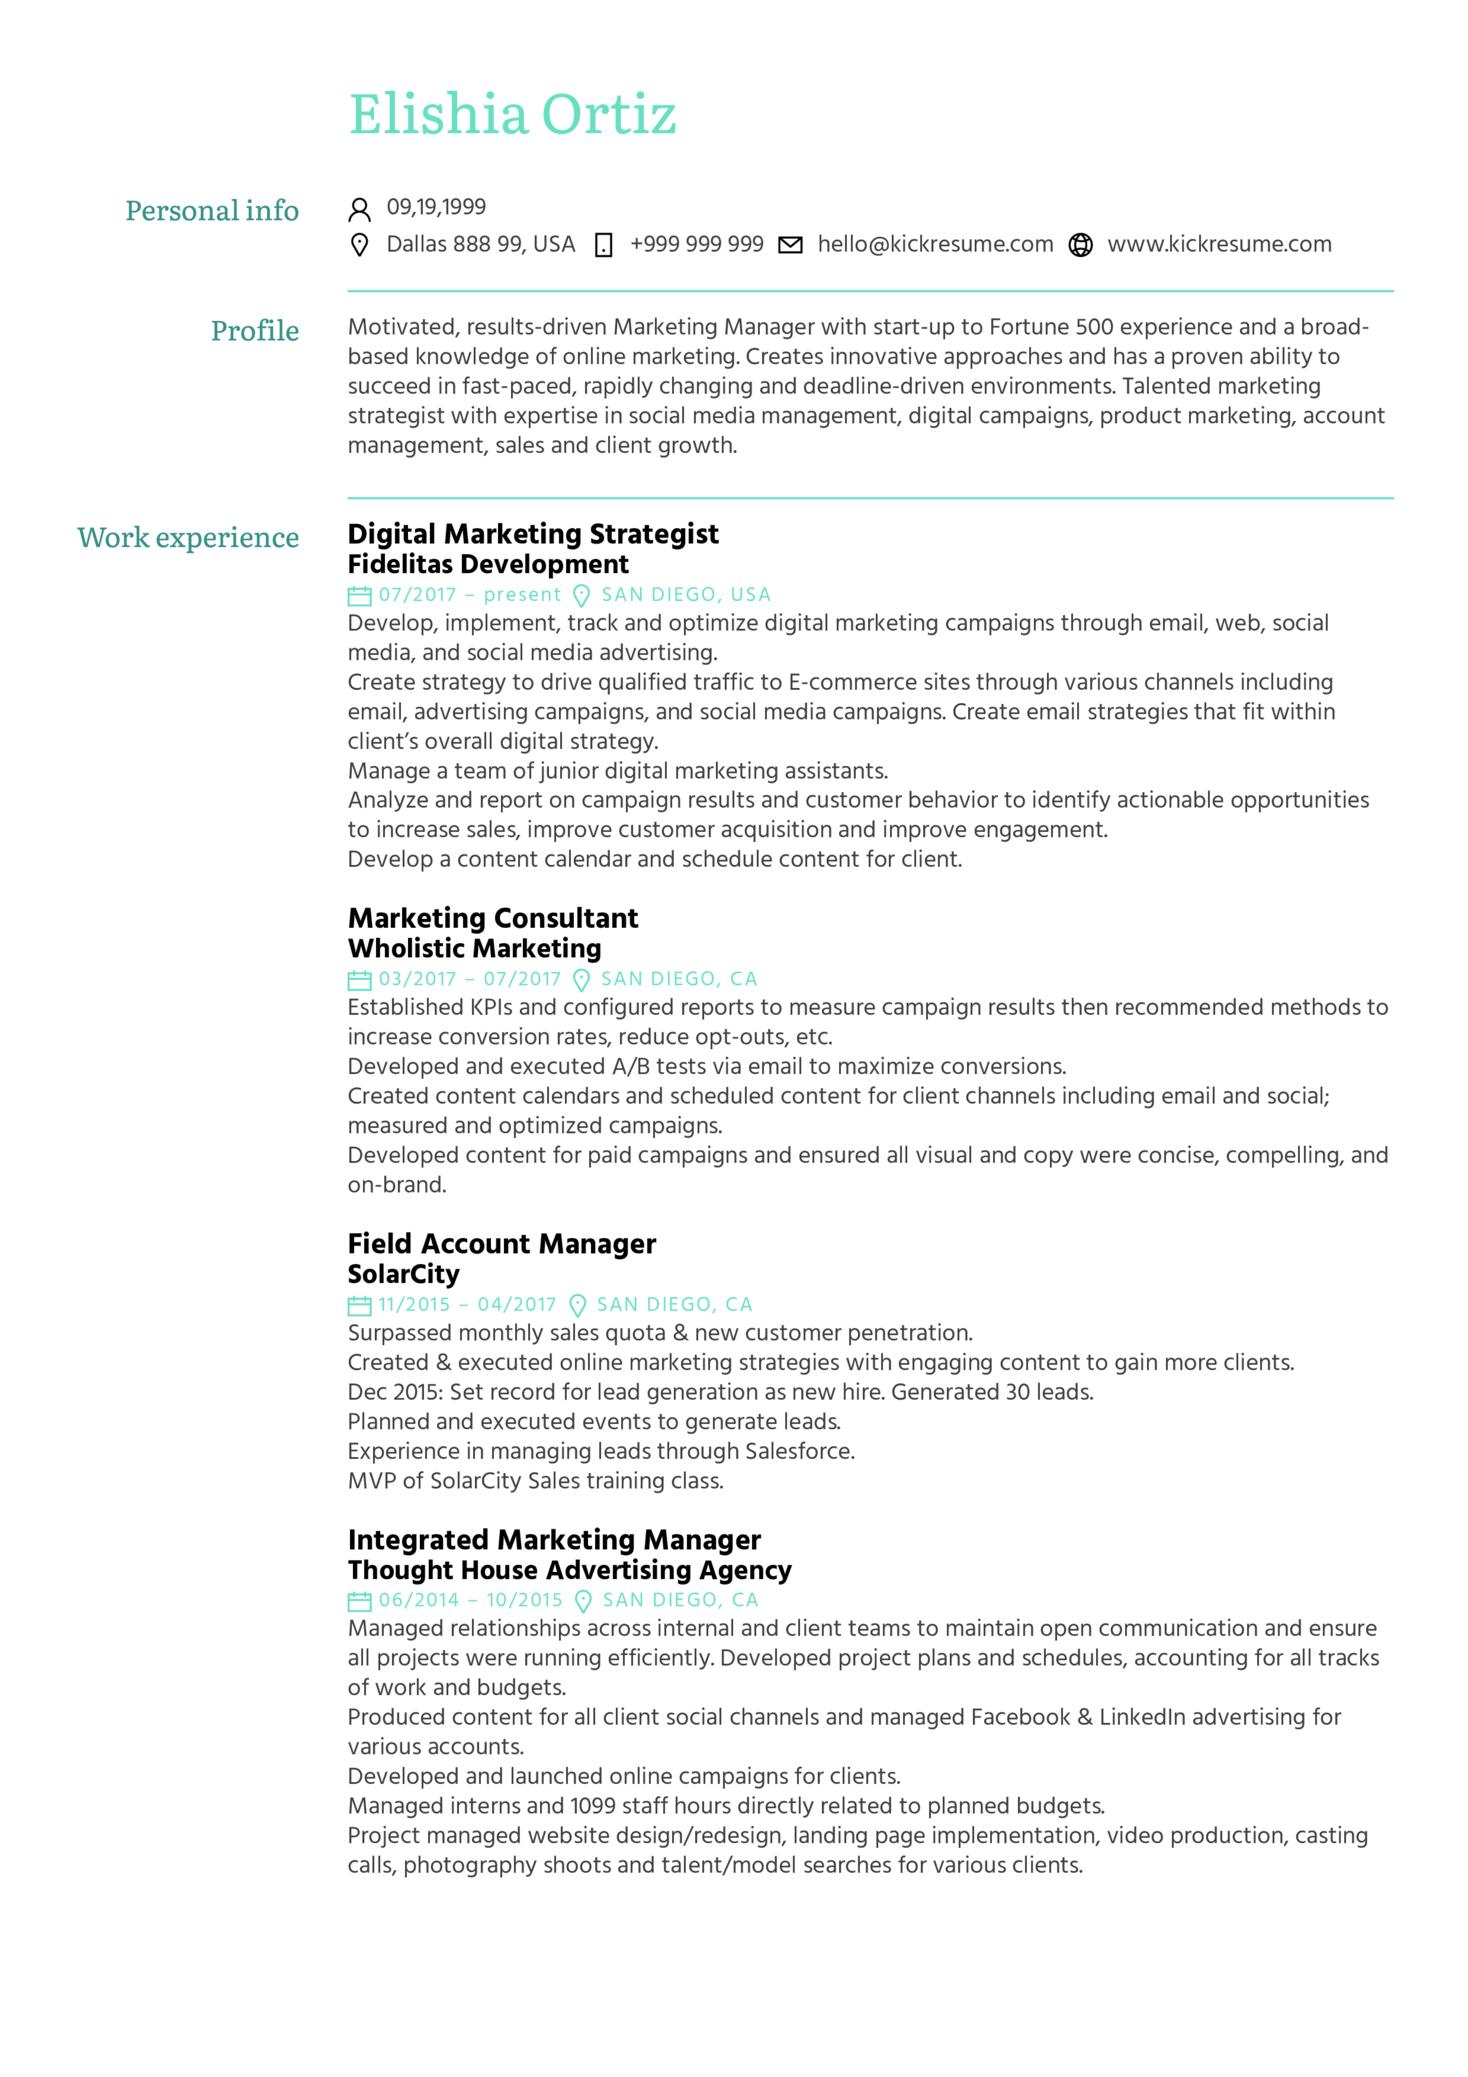 Marketing Strategist Resume Sample (Part 1)